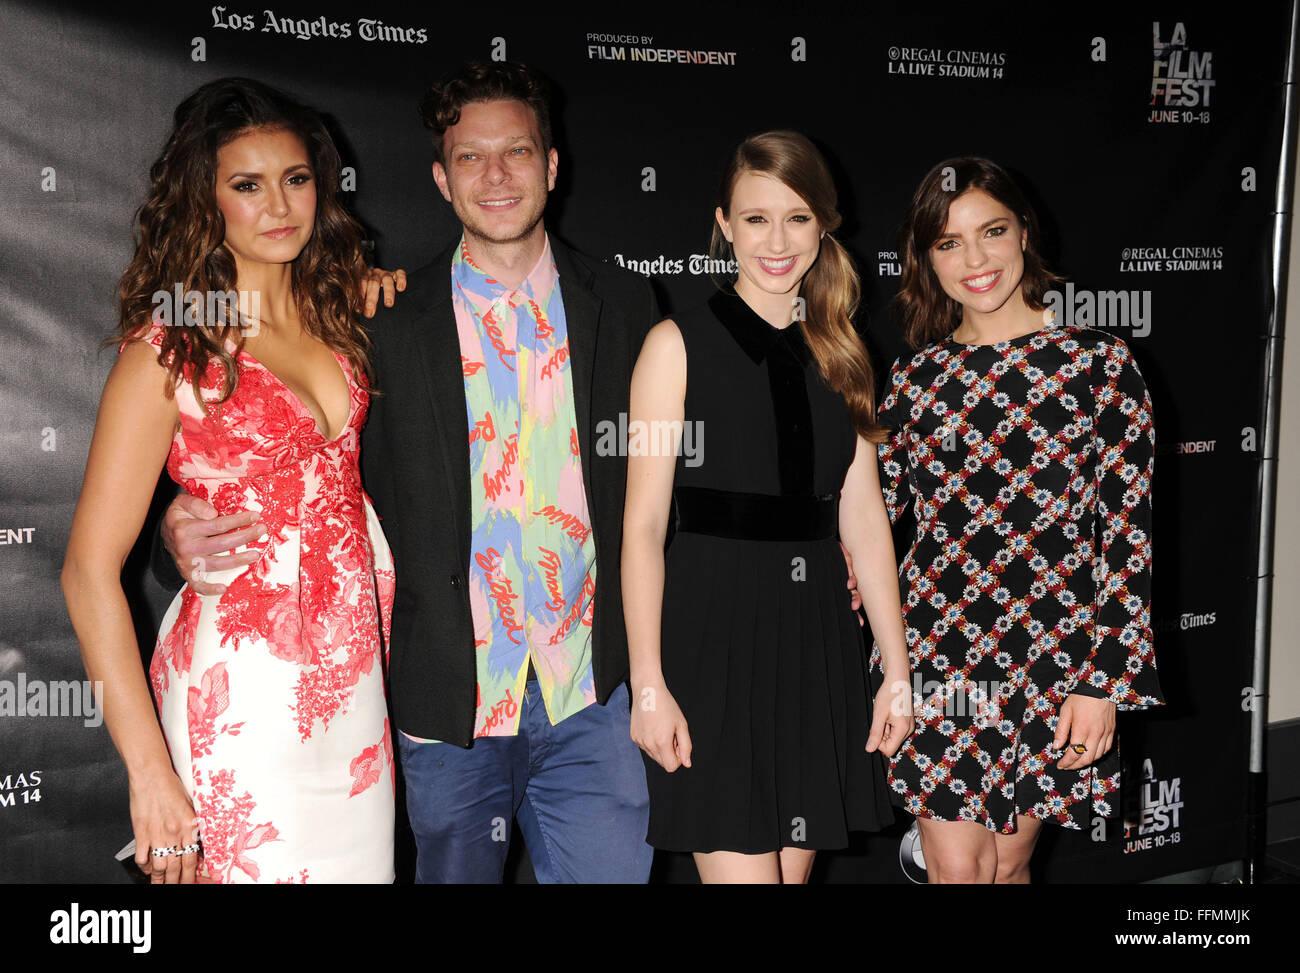 Actress Nina Dobrev, director Todd Strauss-Schulson, and actresses Taissa Farmiga and Angela Trimbur attend 'The - Stock Image